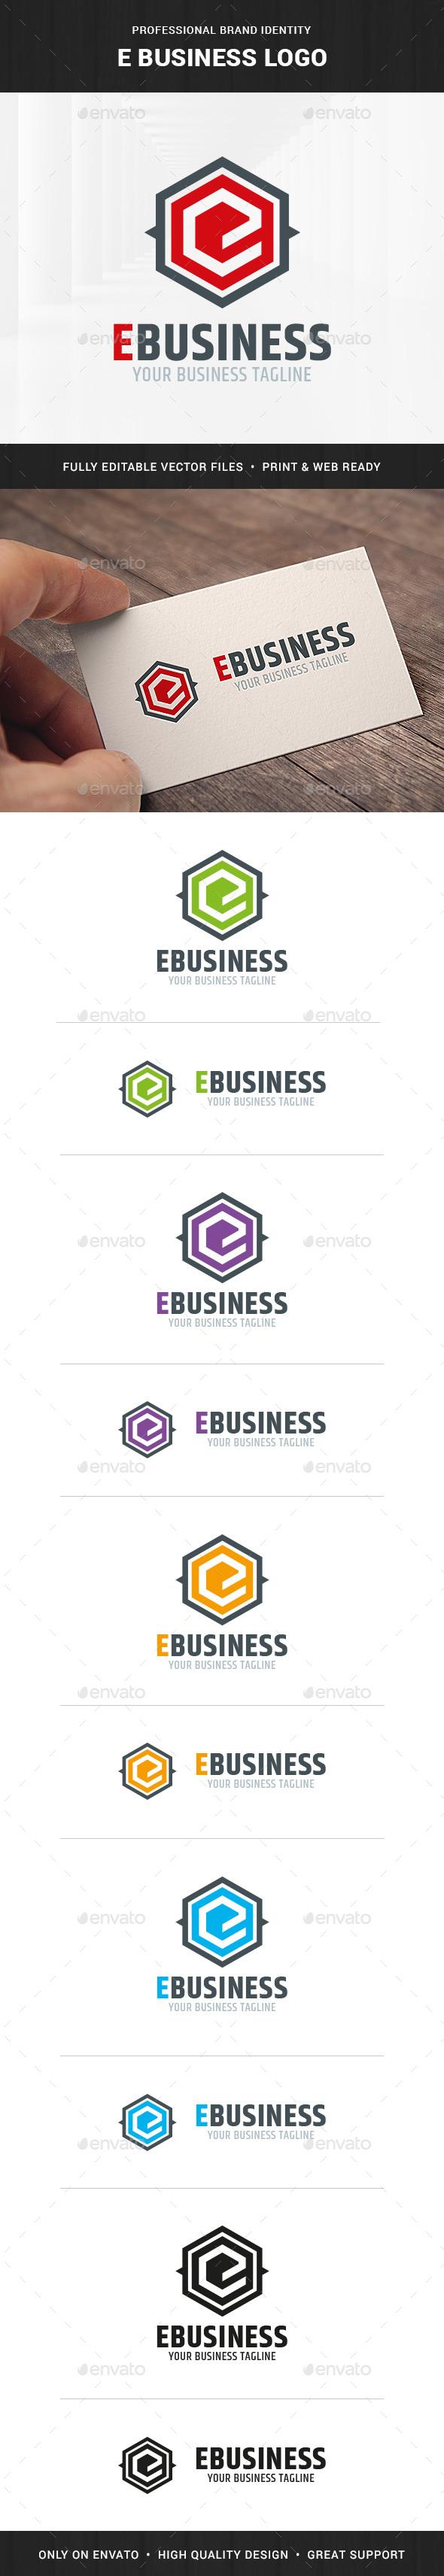 E-Business - Letter E Logo Template